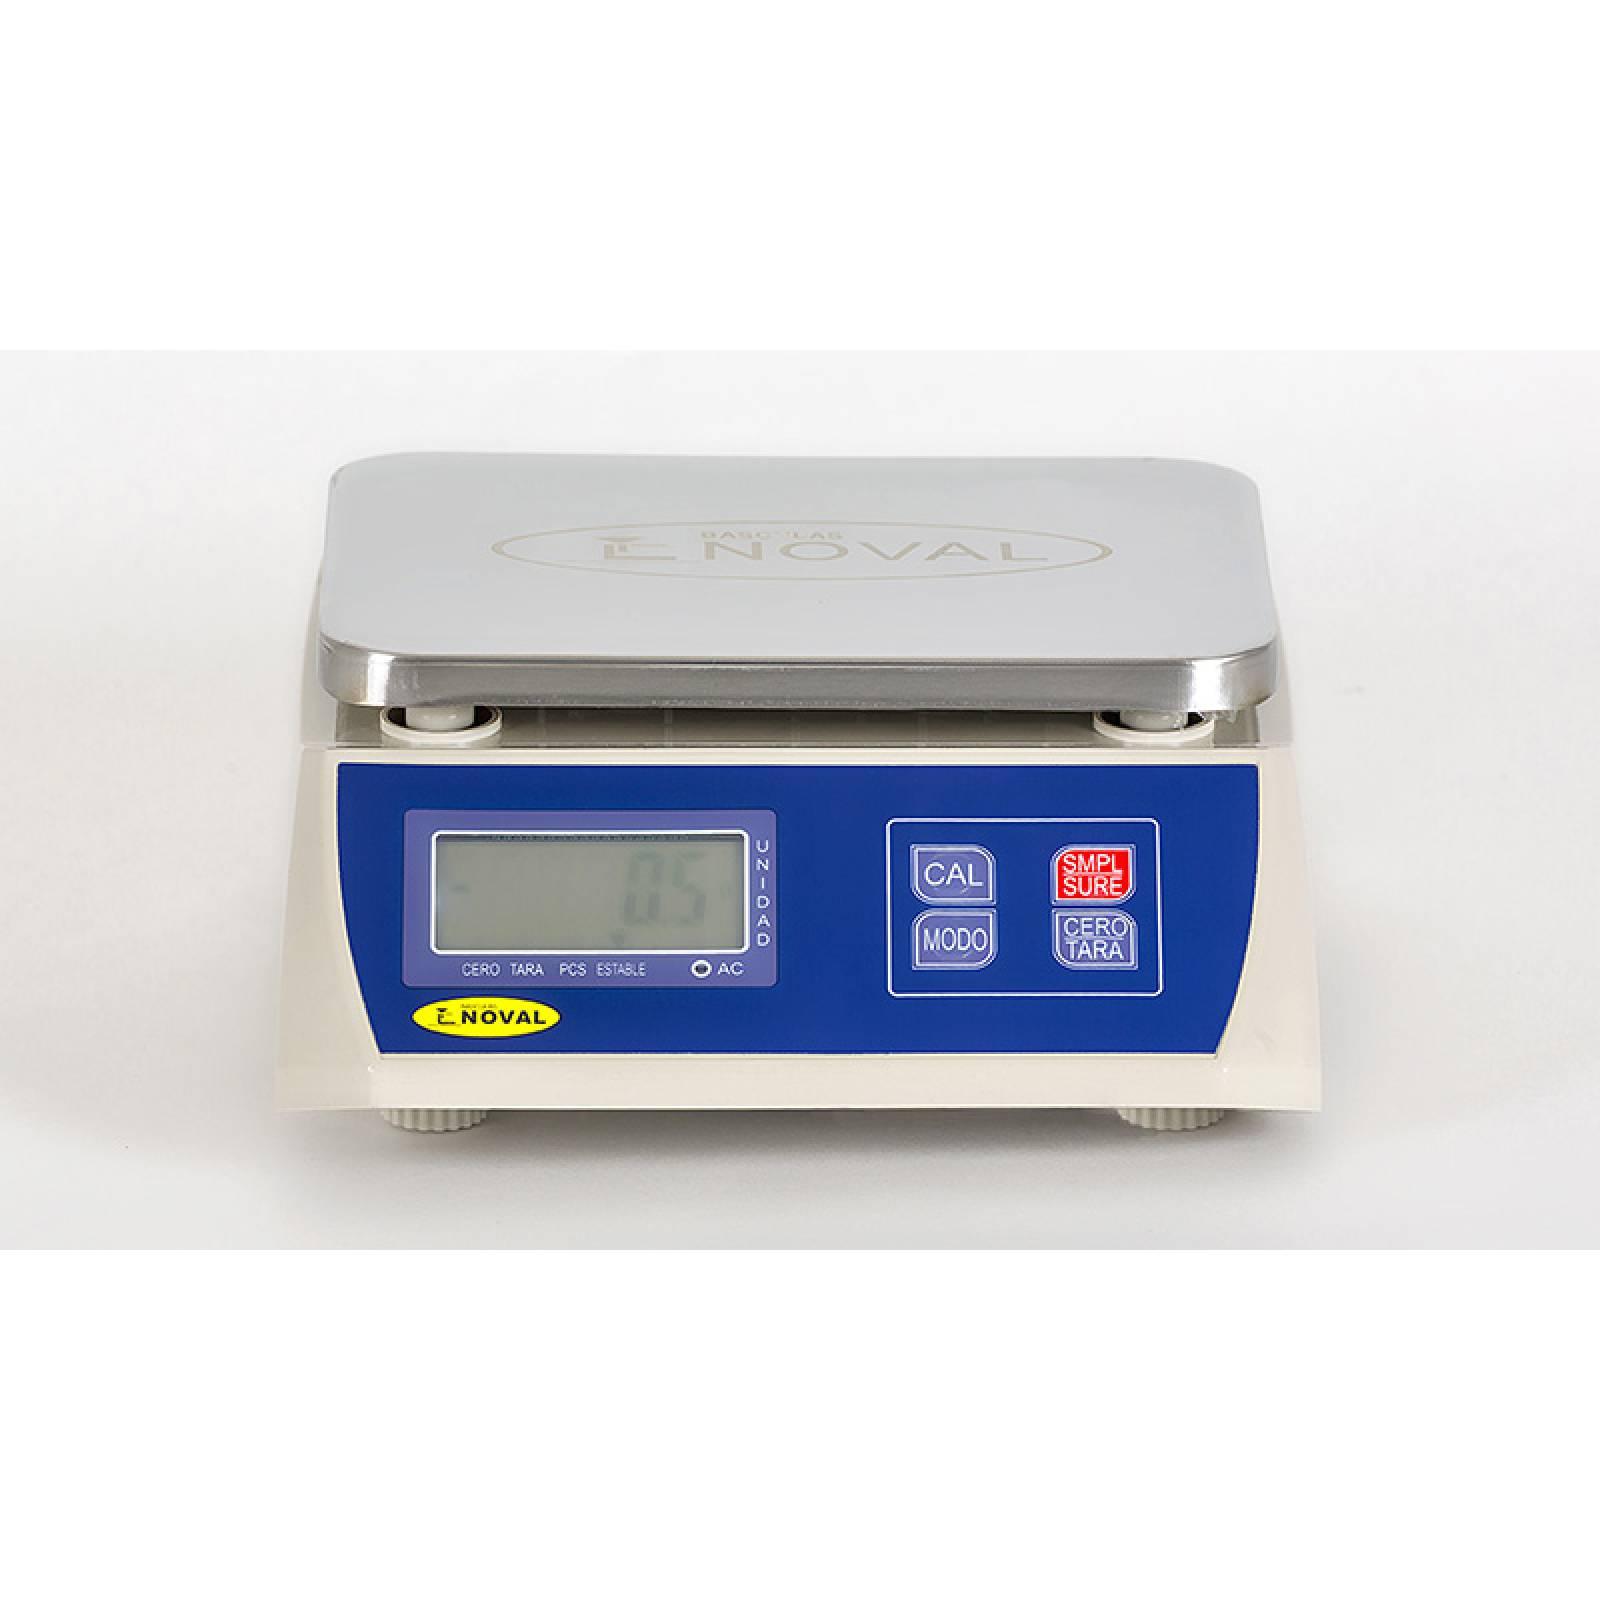 Bascula Porcionadora 3 Kg Div 0.1 gr PTN 3 Noval